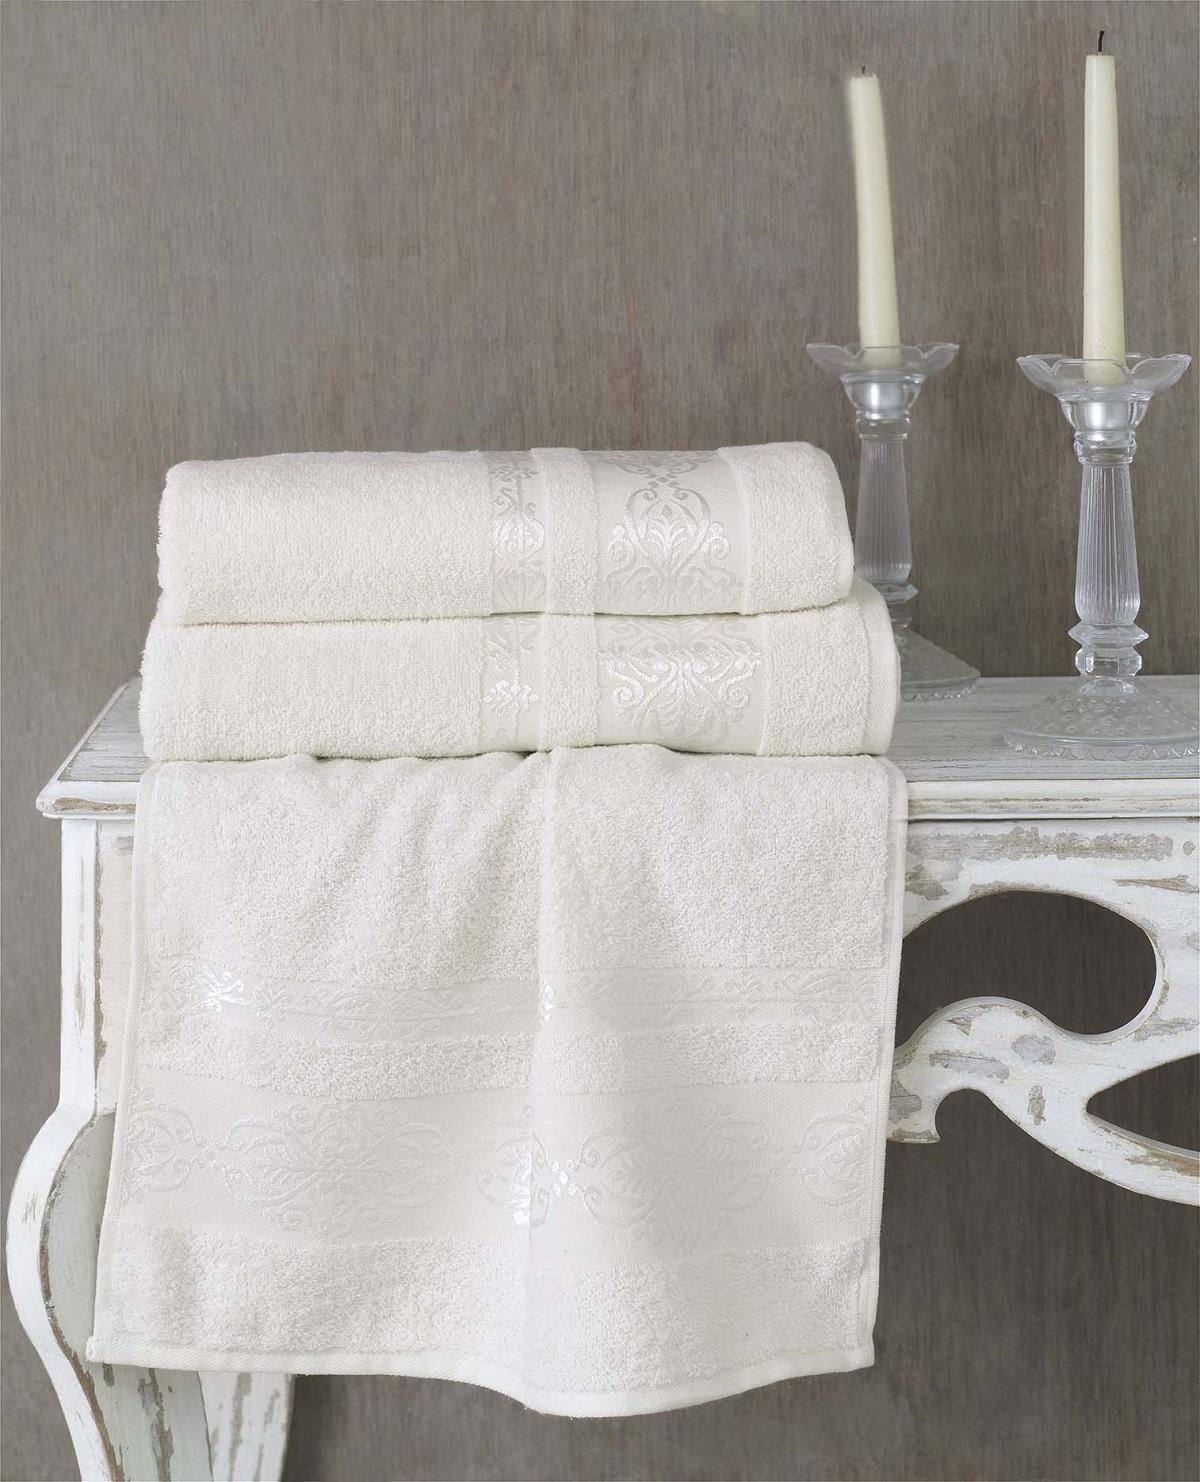 Полотенца Karna Полотенце Rebeka Цвет: Кремовый (70х140 см) полотенца karna полотенце iteka цвет коричневый 70х140 см